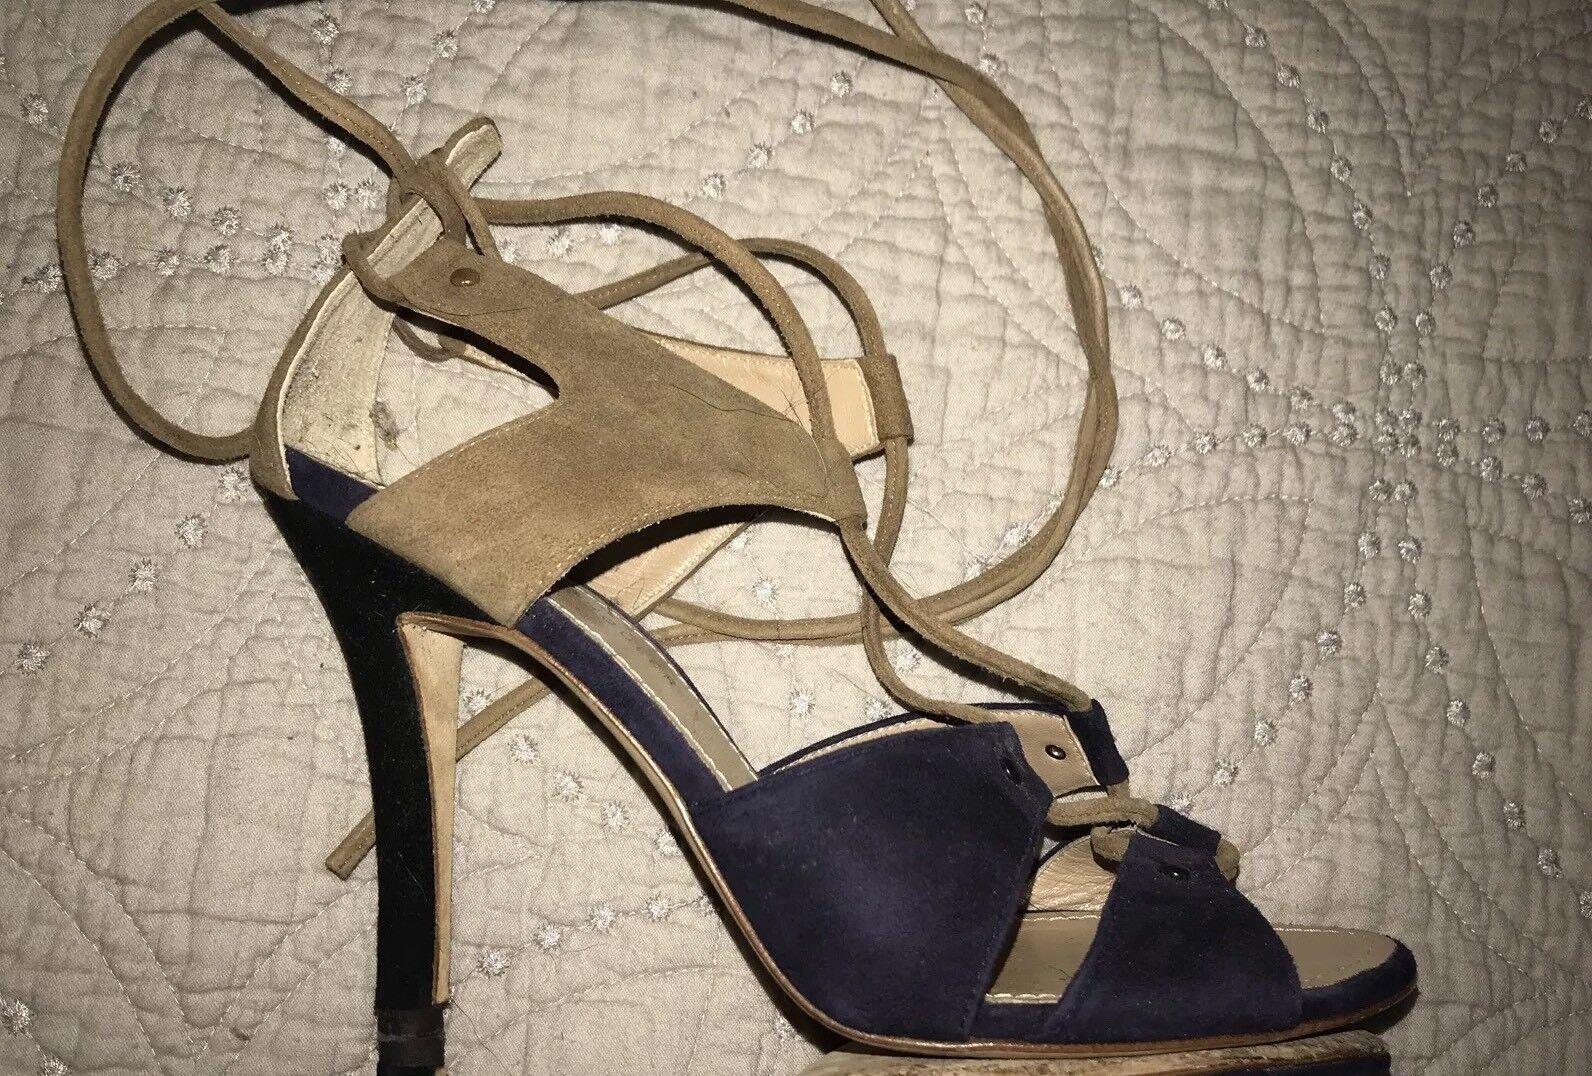 Proenza Schouler Navy Blau Tan Taupe Suede Lace Up Sandales Heels 39 EUC